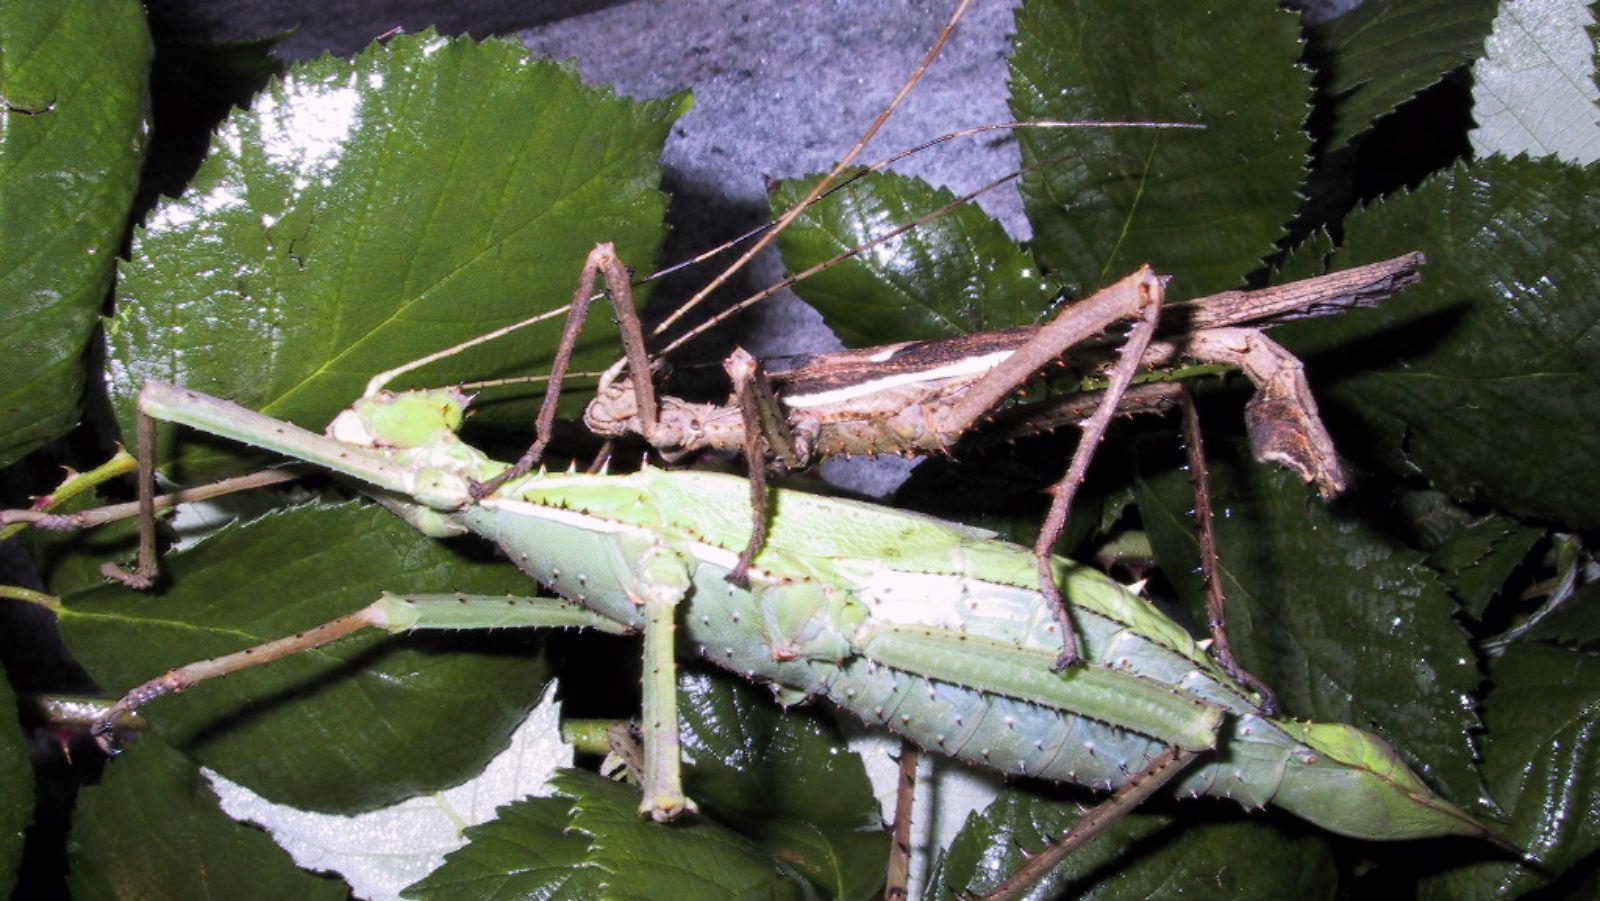 größte insekt der welt